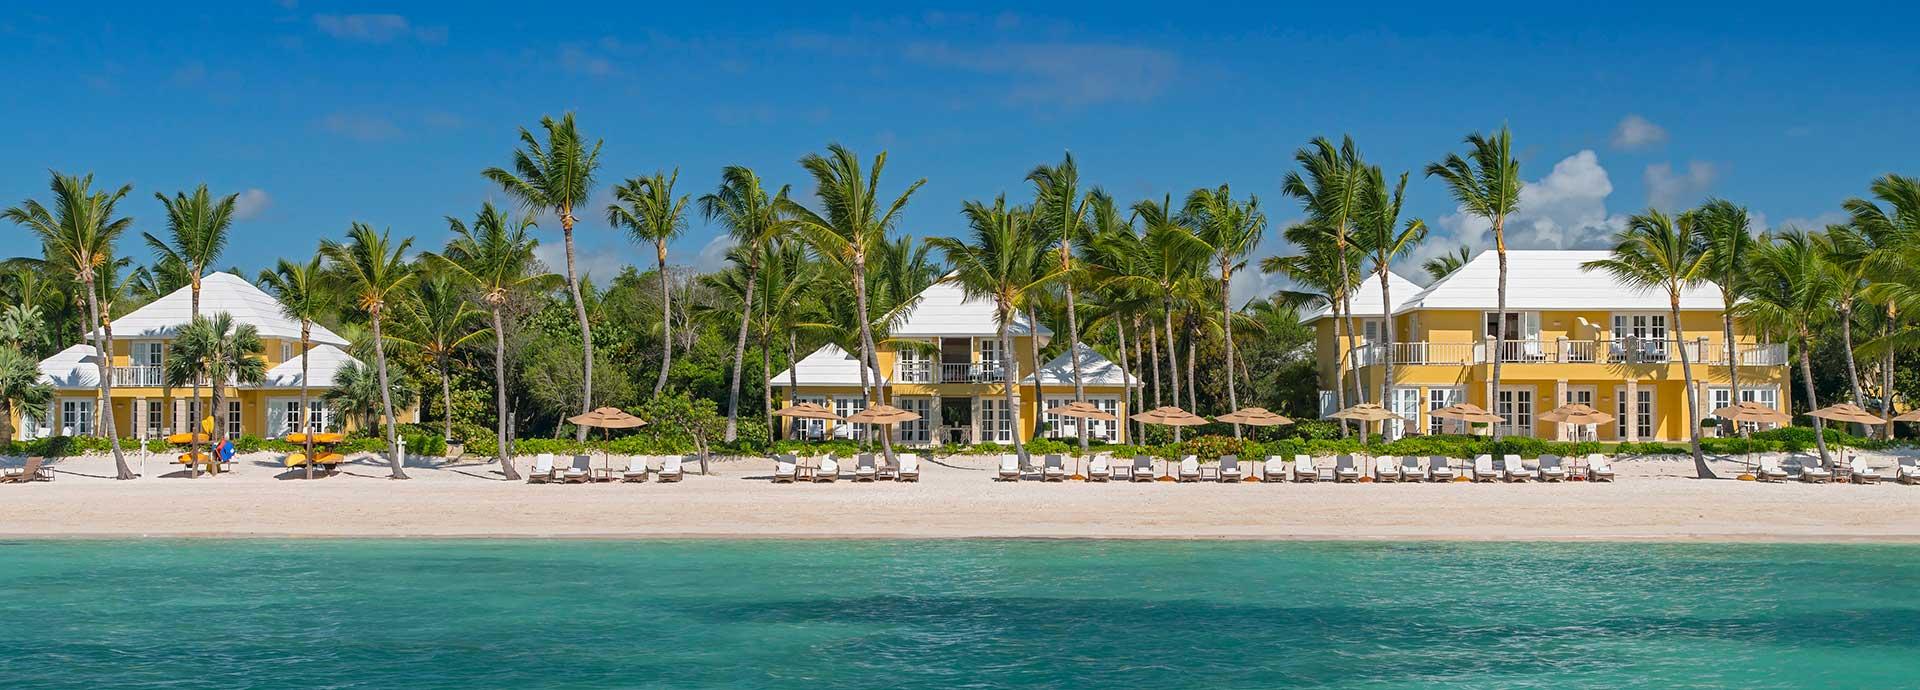 Wärtsilä and Grupo Puntacana - Electrifying a Caribbean paradise